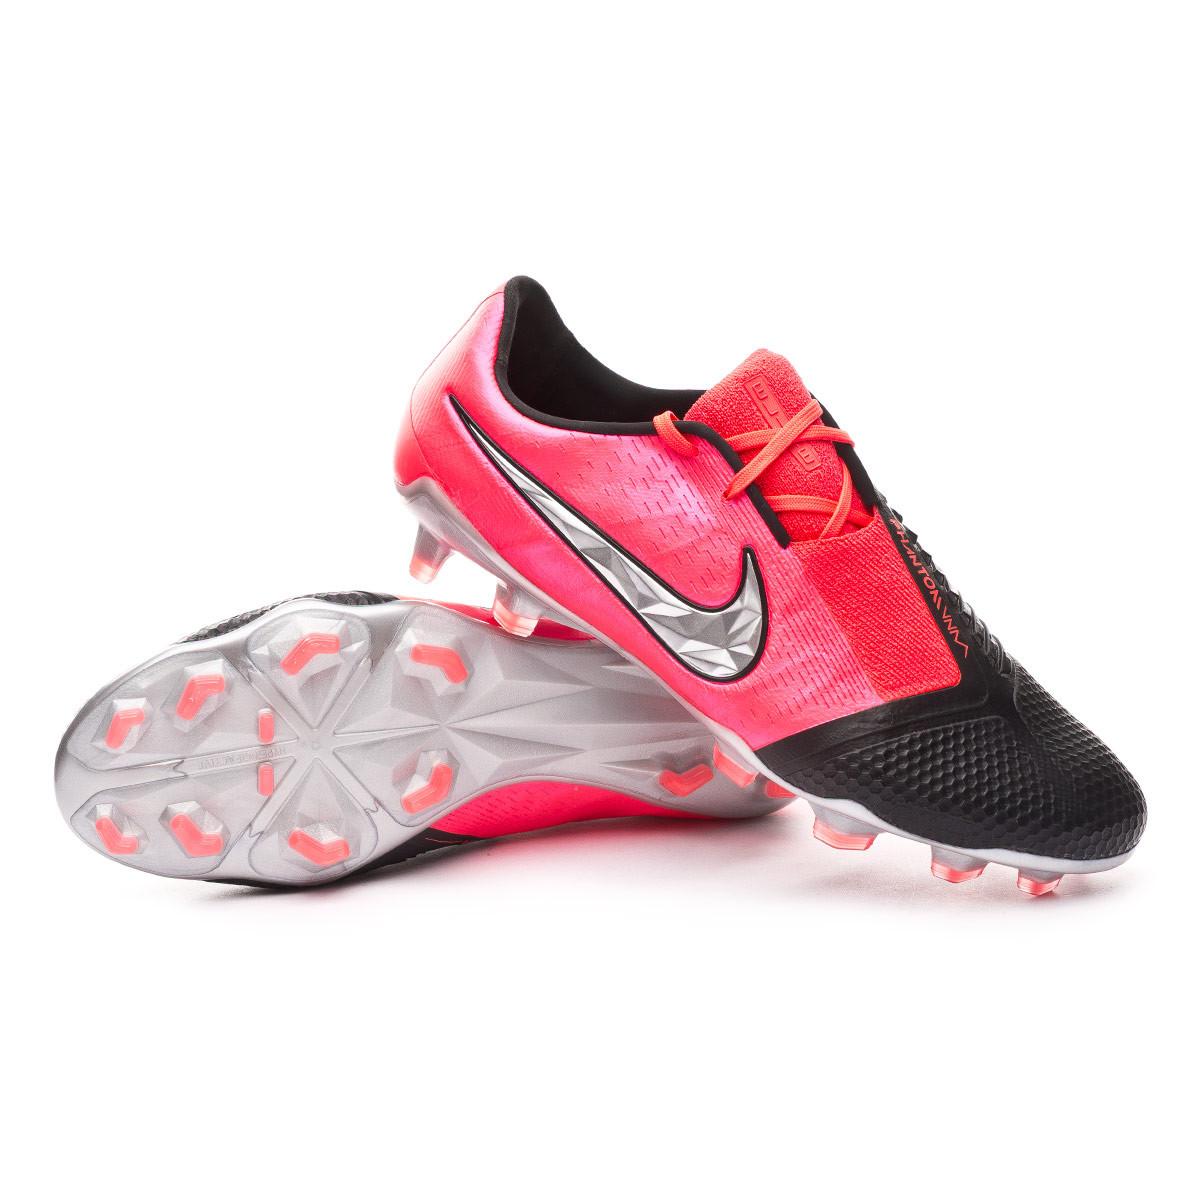 nike phantom boots red